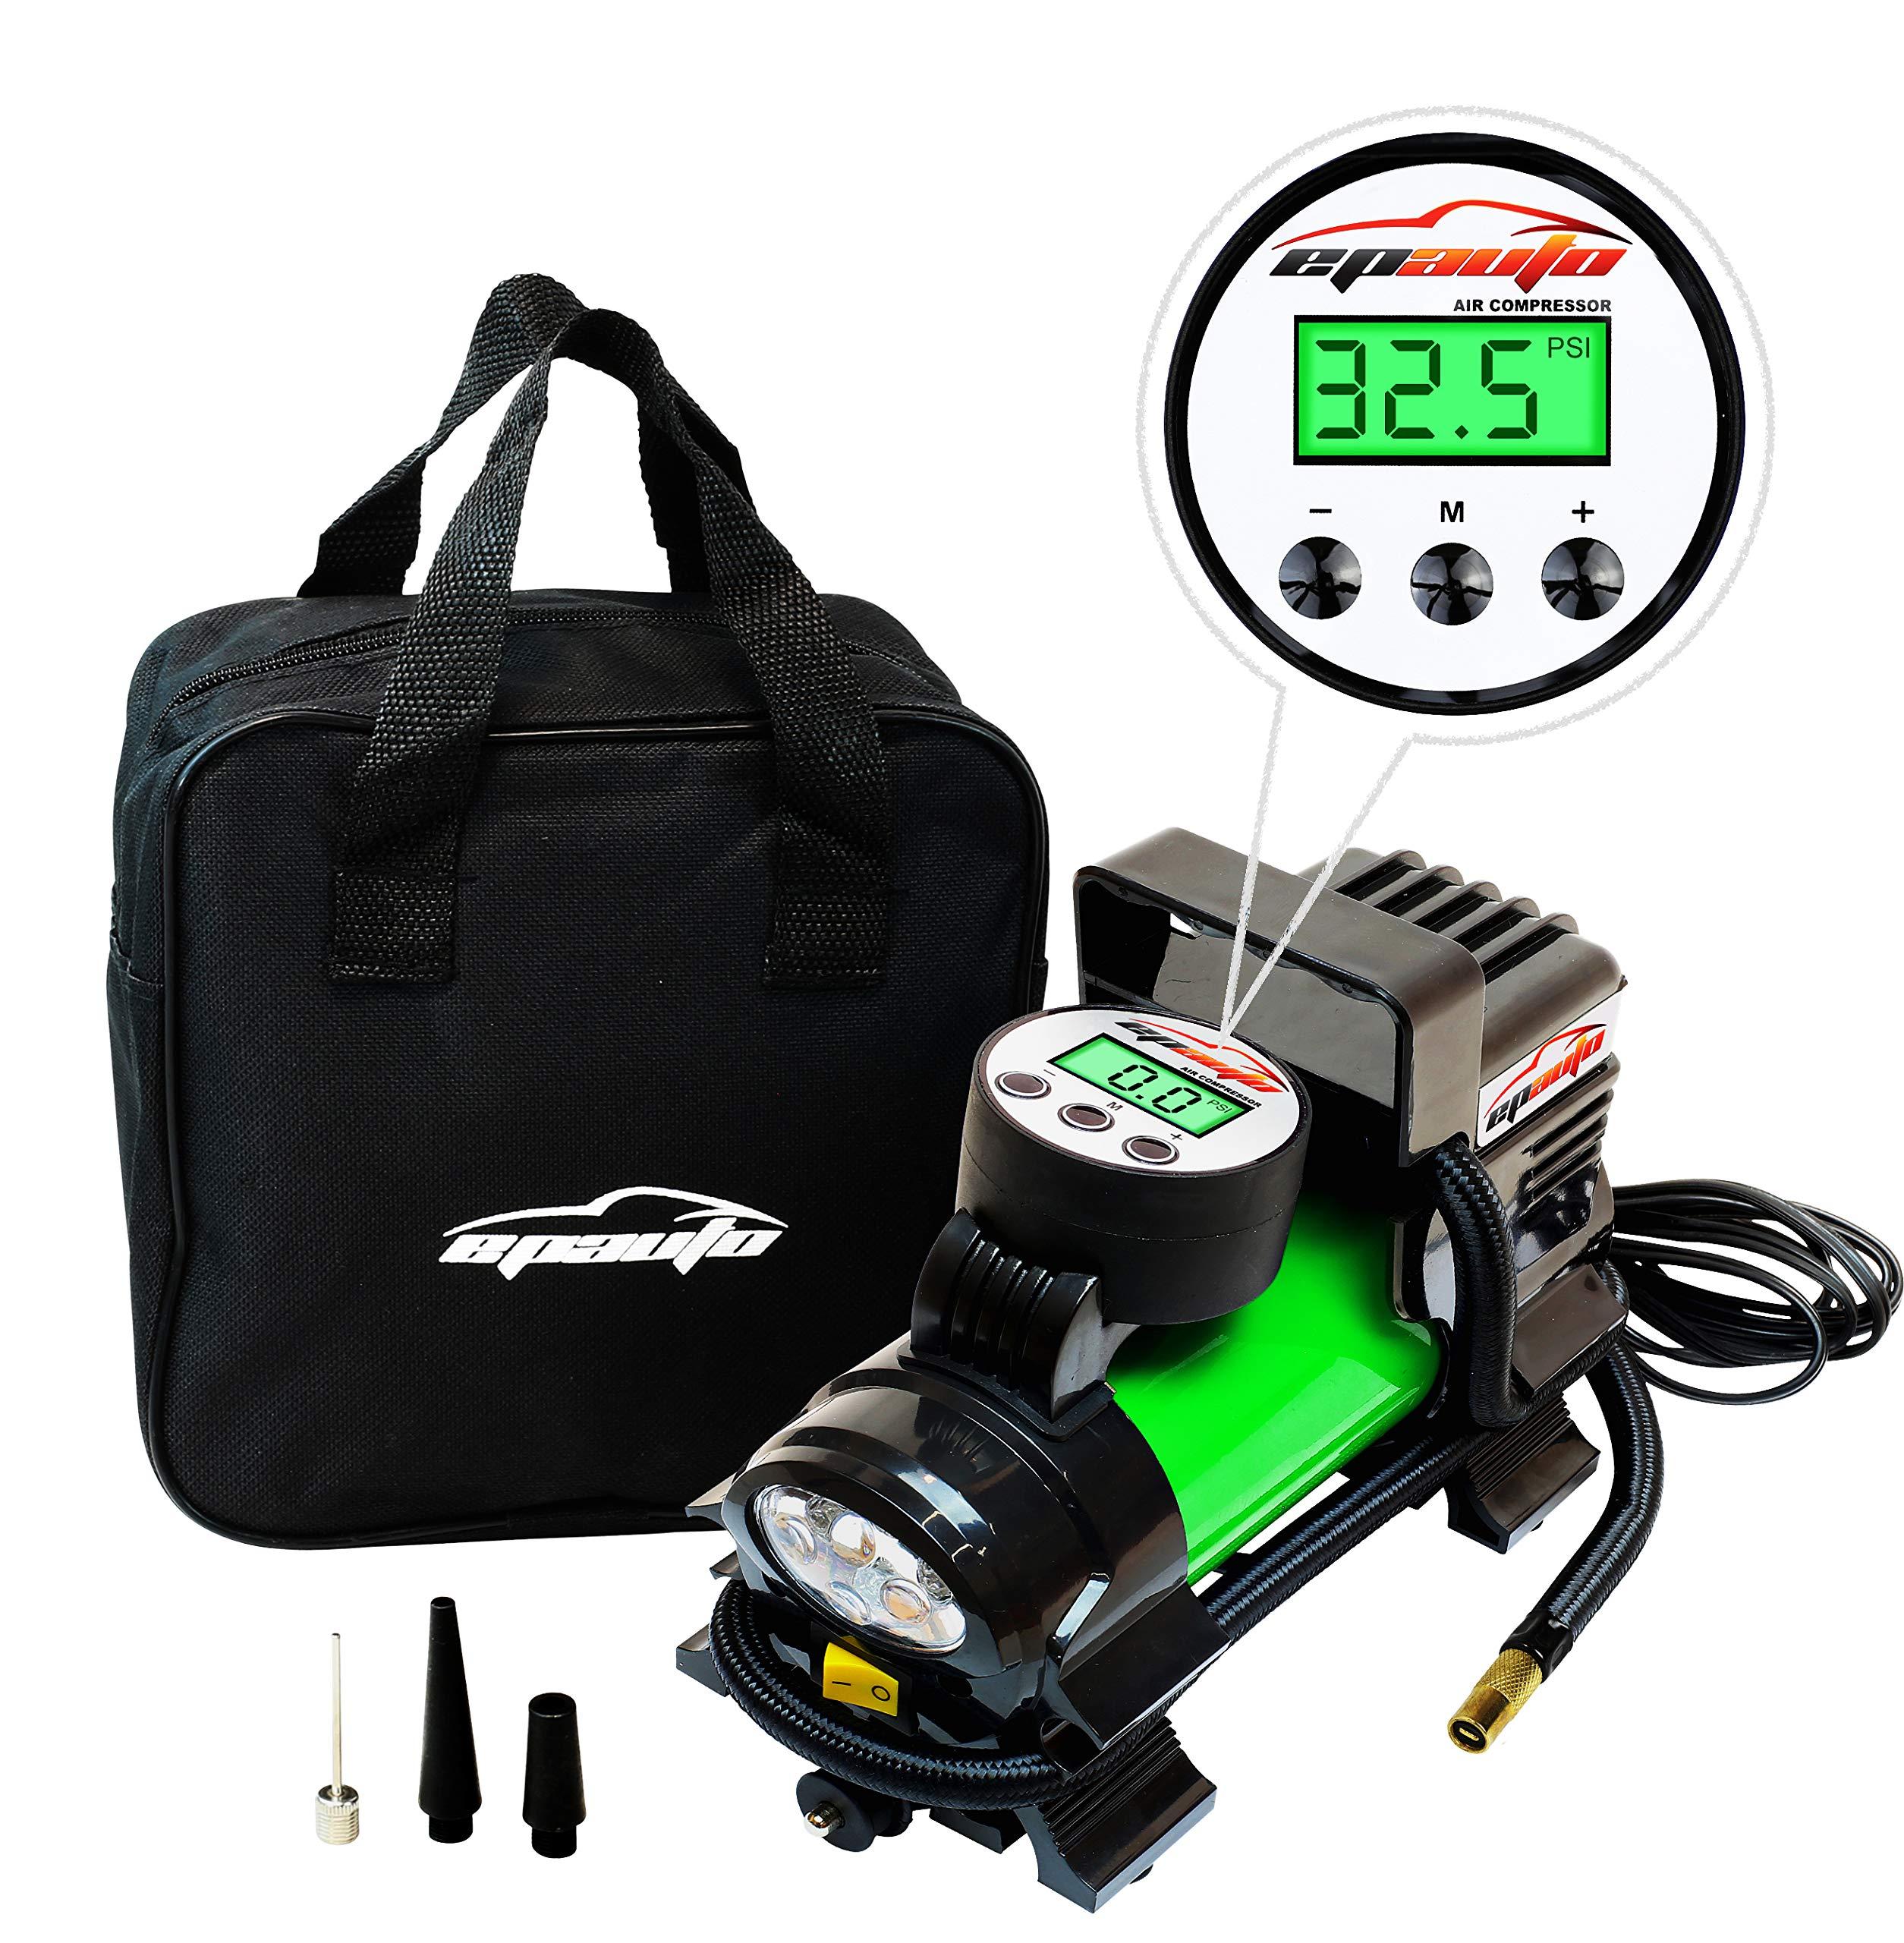 EPAuto 12V DC Portable Air Compressor Pump, Digital Tire Inflator by EPAuto (Image #2)